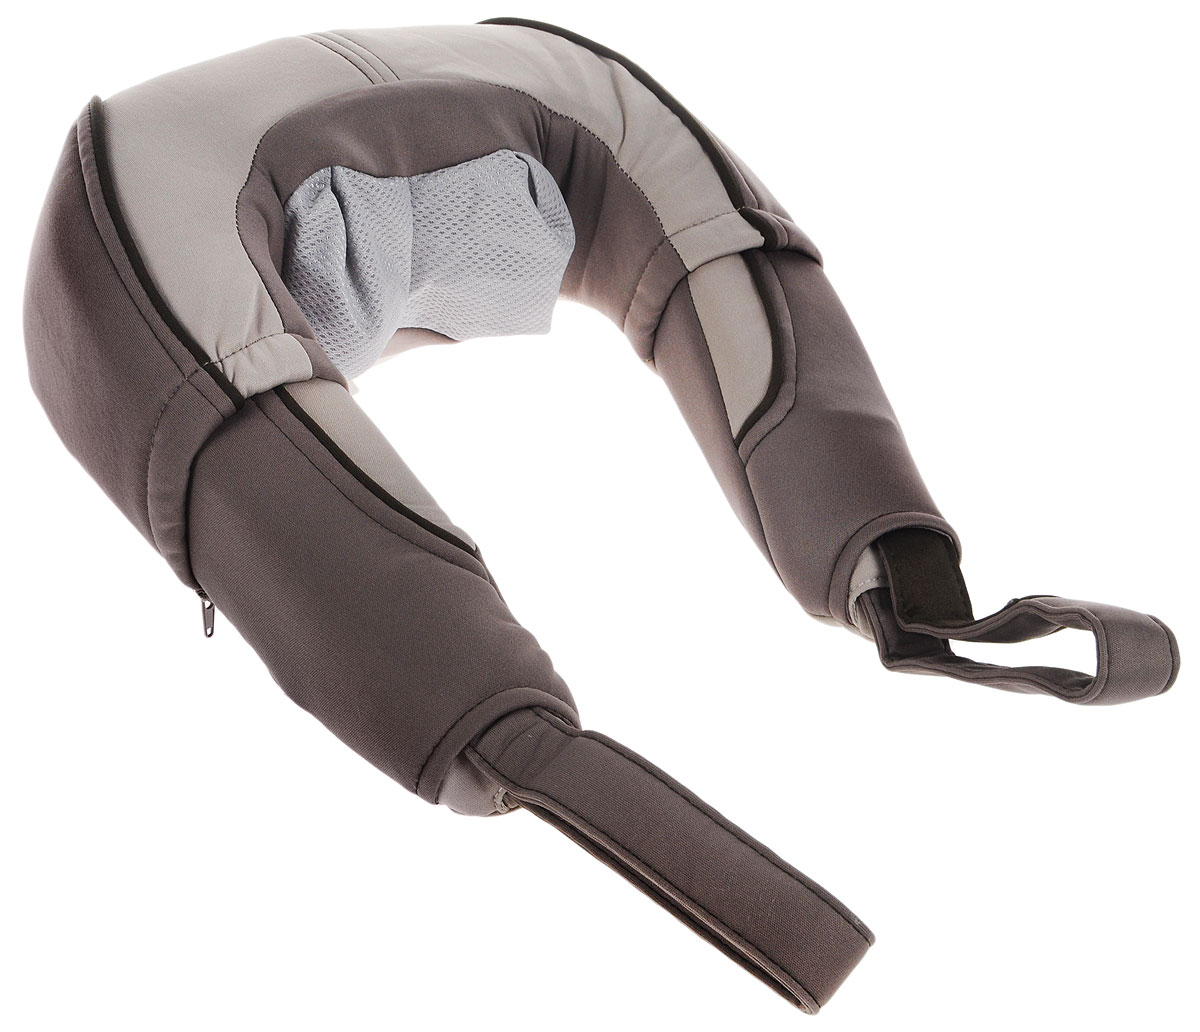 HoMedics NMS-250-EU массажер для шеи